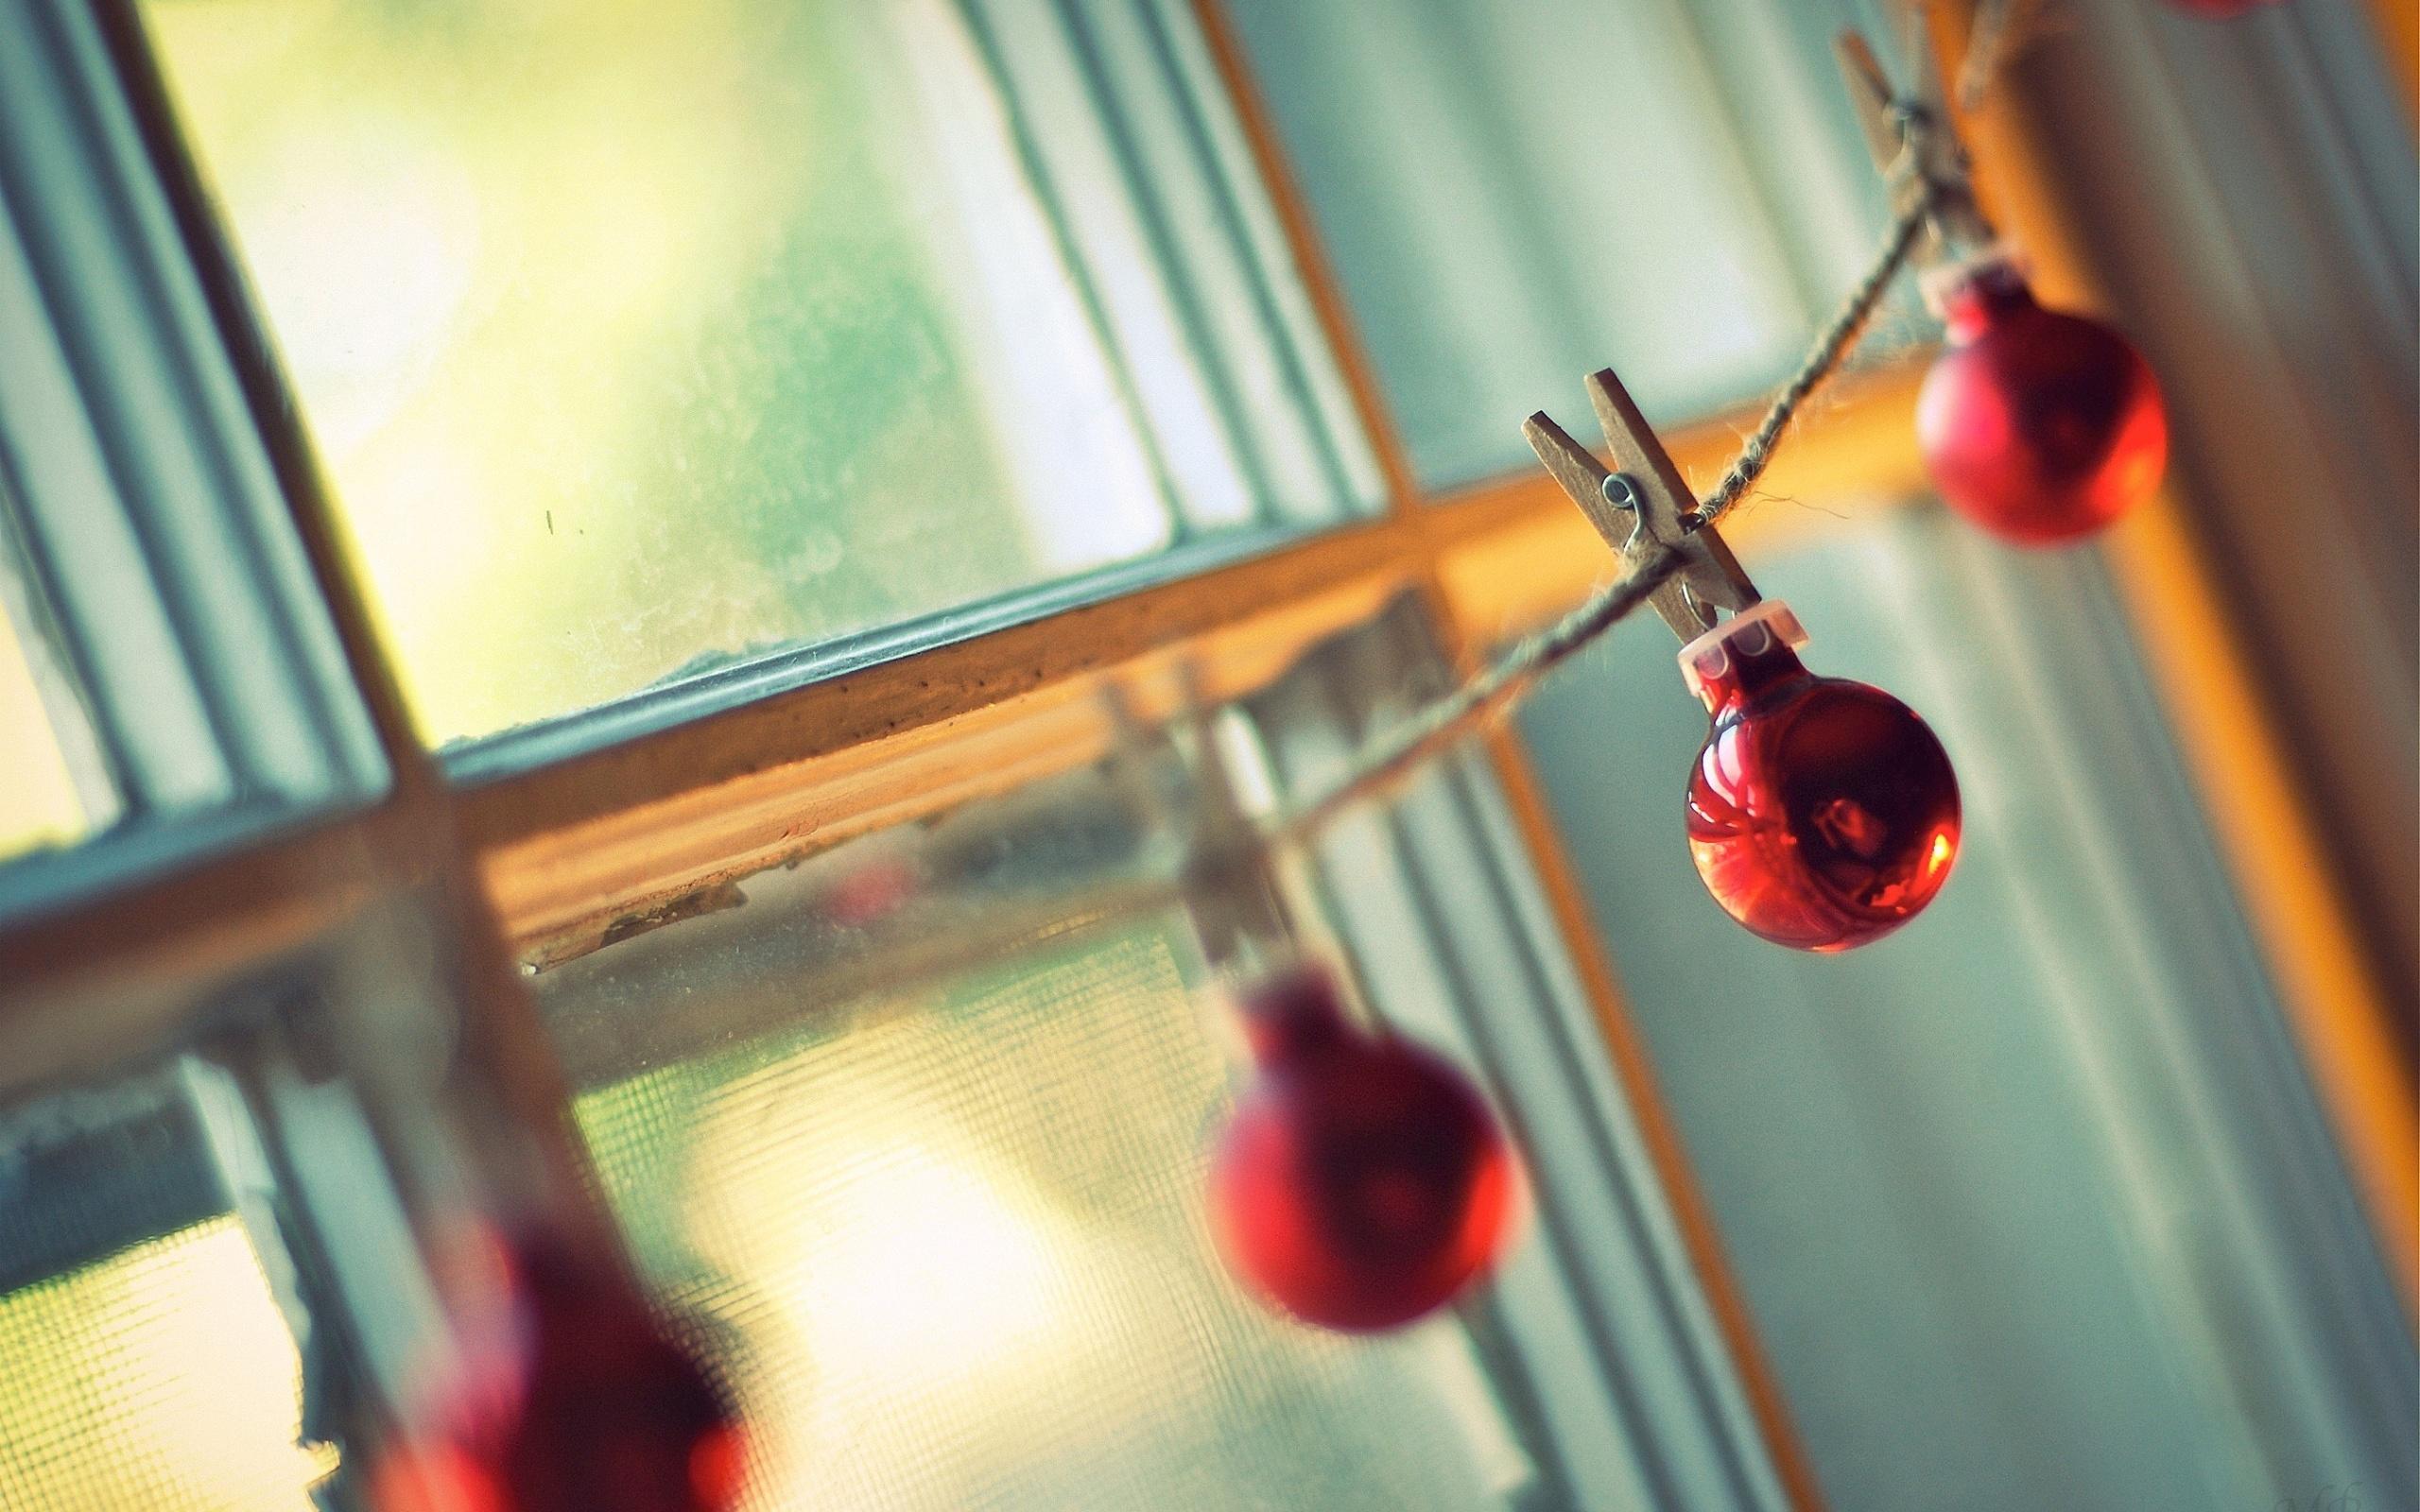 шарики, прищепки, окно